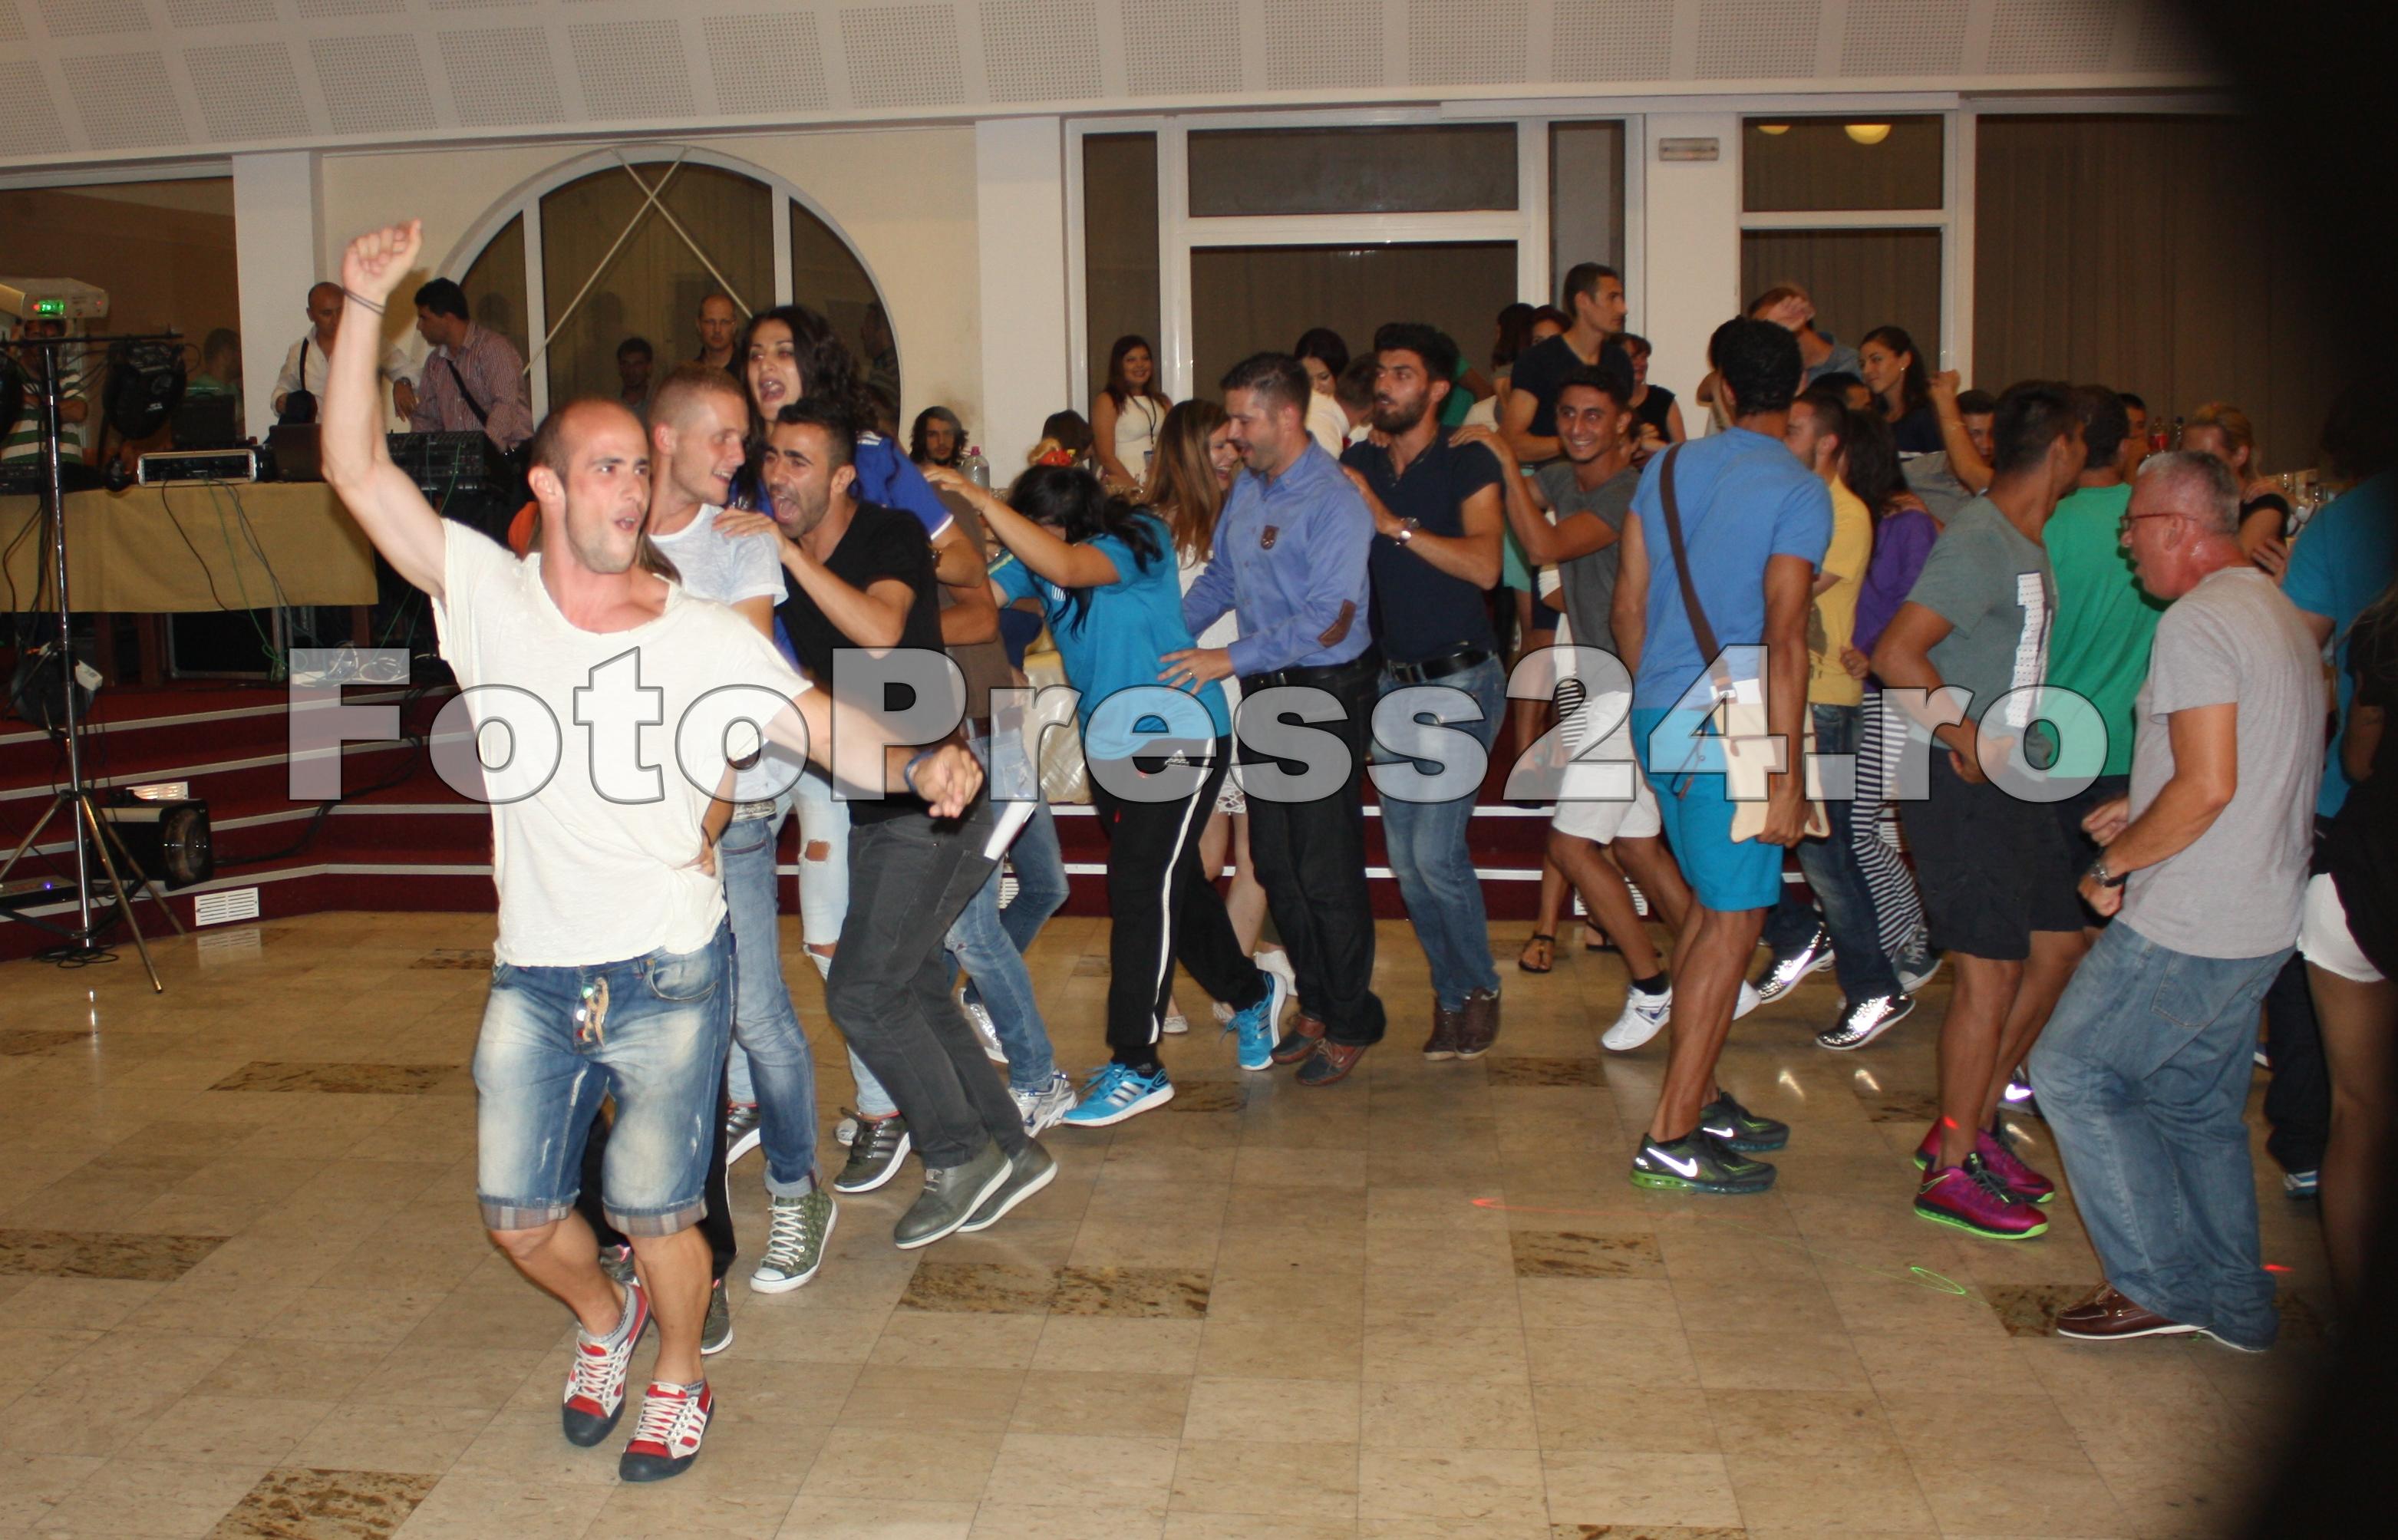 petrecere_star-fotopress24 (9)